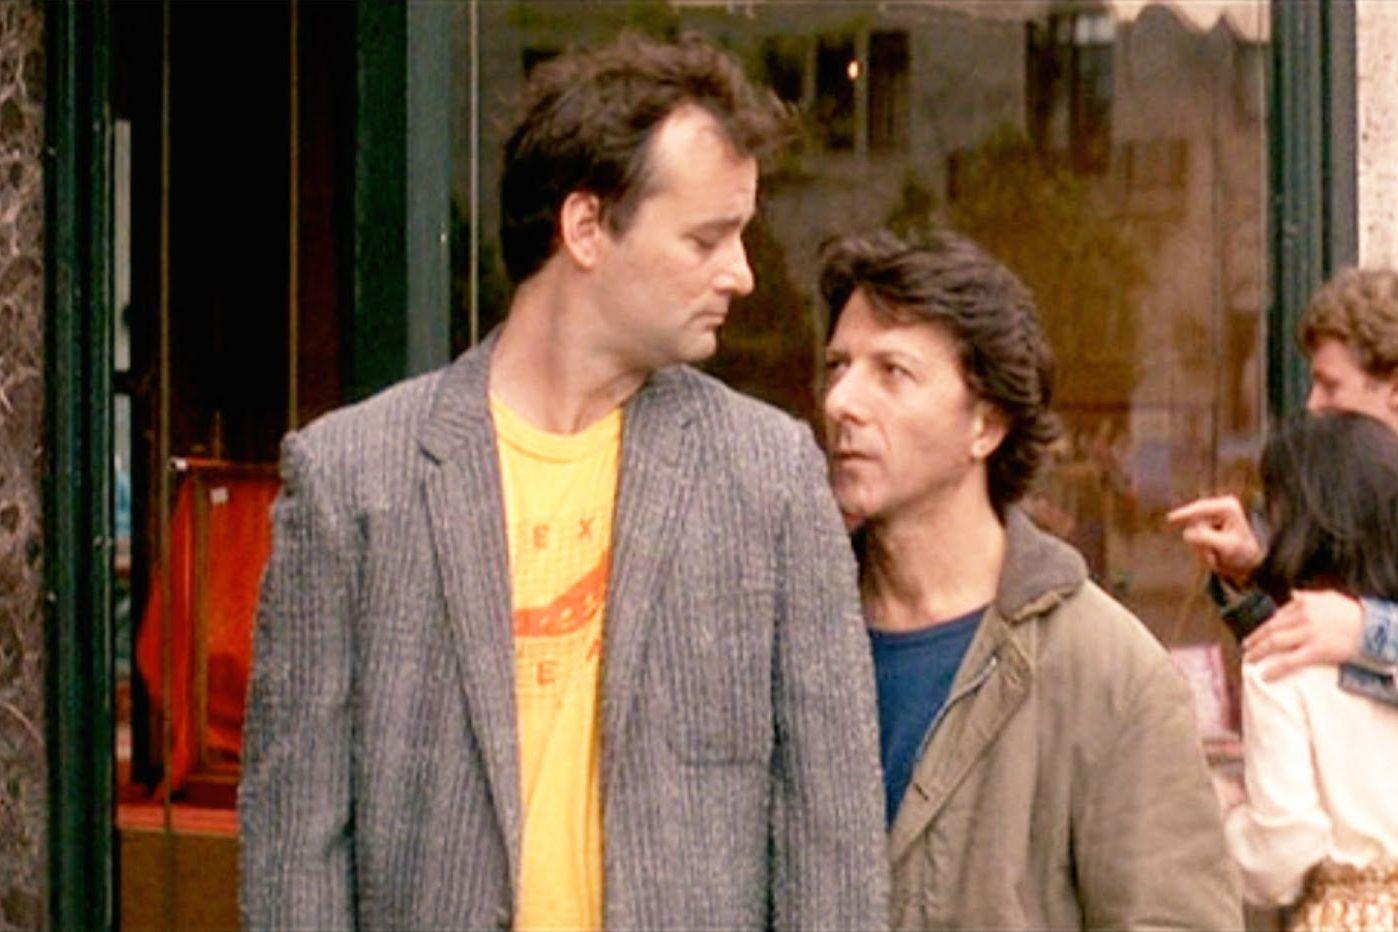 10. Tootsie (1982)